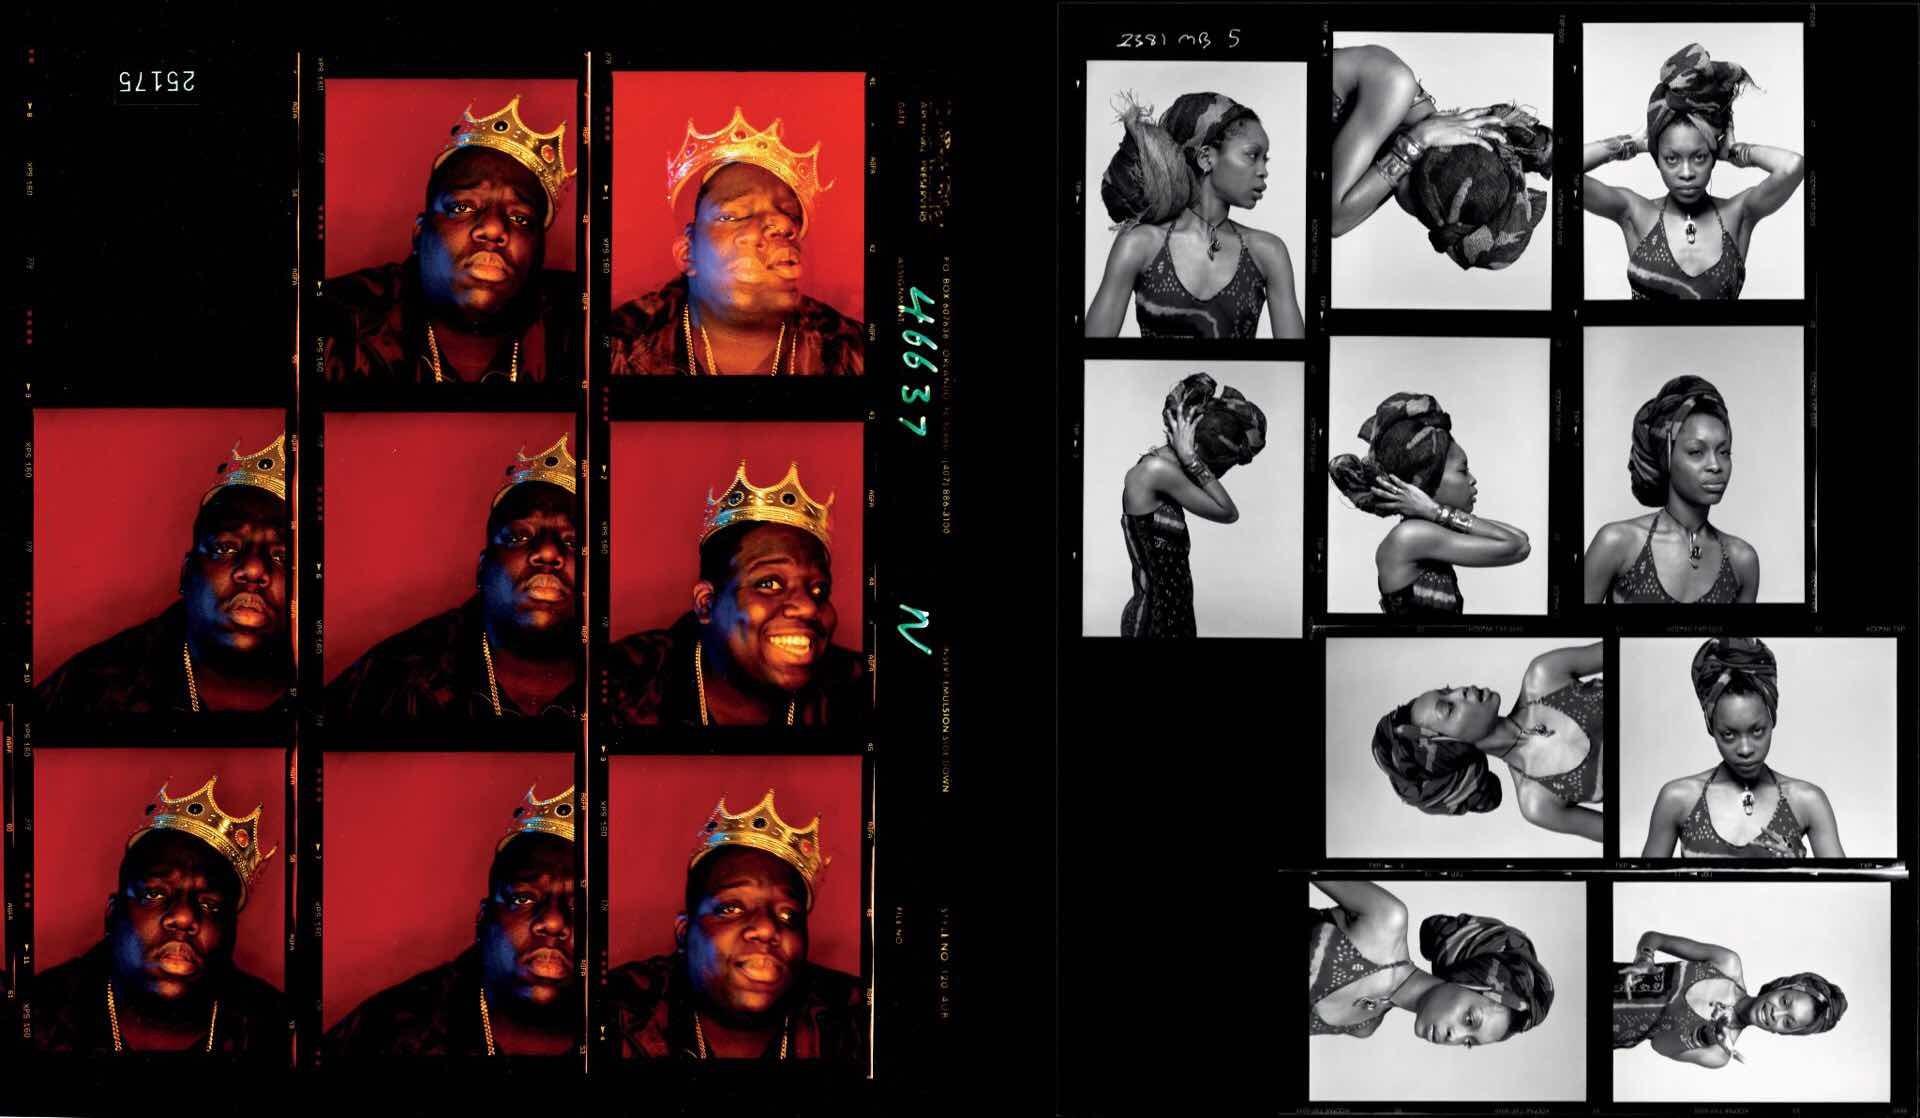 Photos by Barron Claiborne (left) and Marc Baptiste (right)